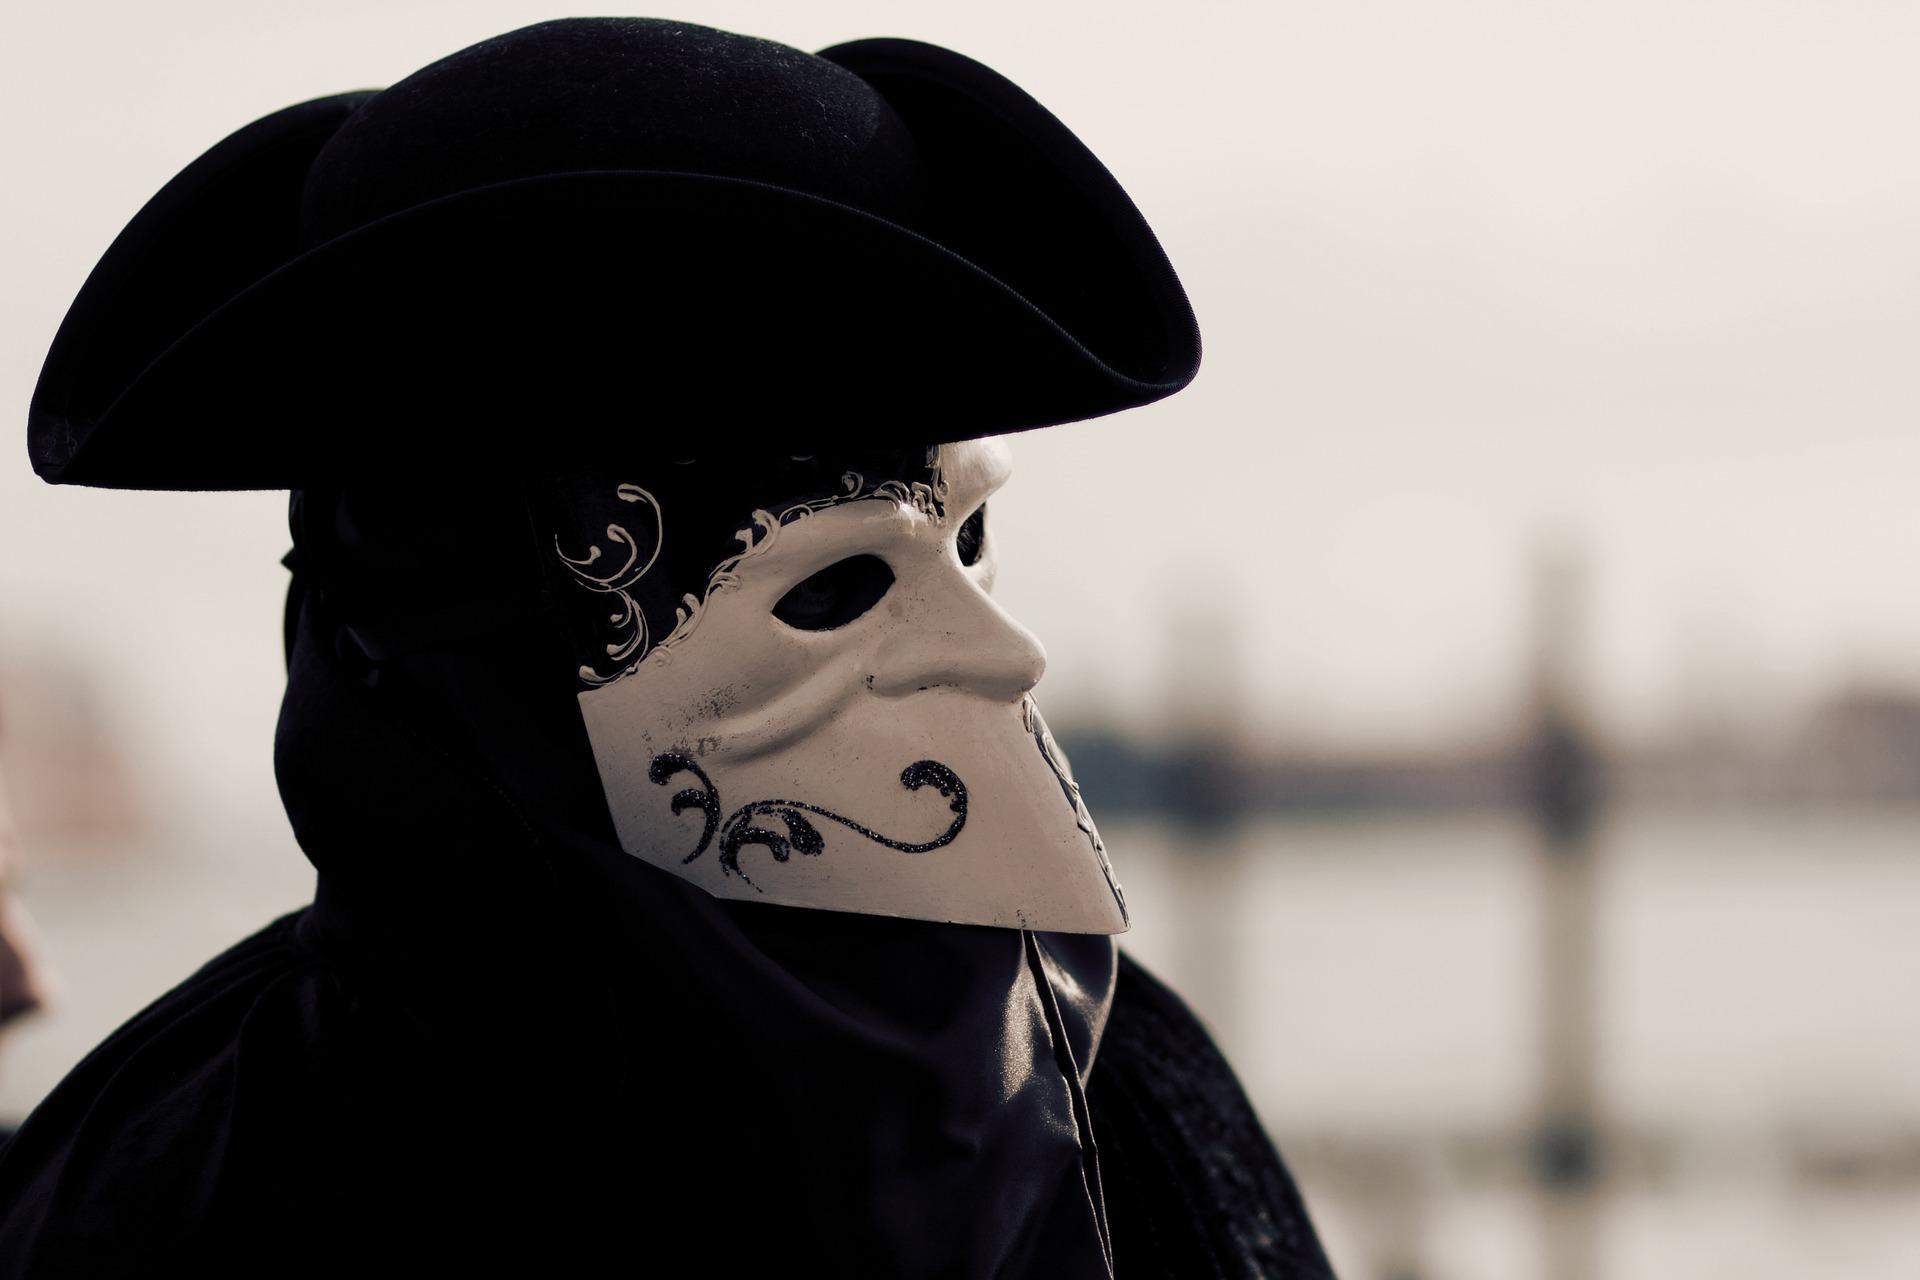 Carnaval de Venecia, Italia carnaval de venecia - 40321047142 009251d53b o - Carnaval de Venecia : la historia y elegancia toman la calle